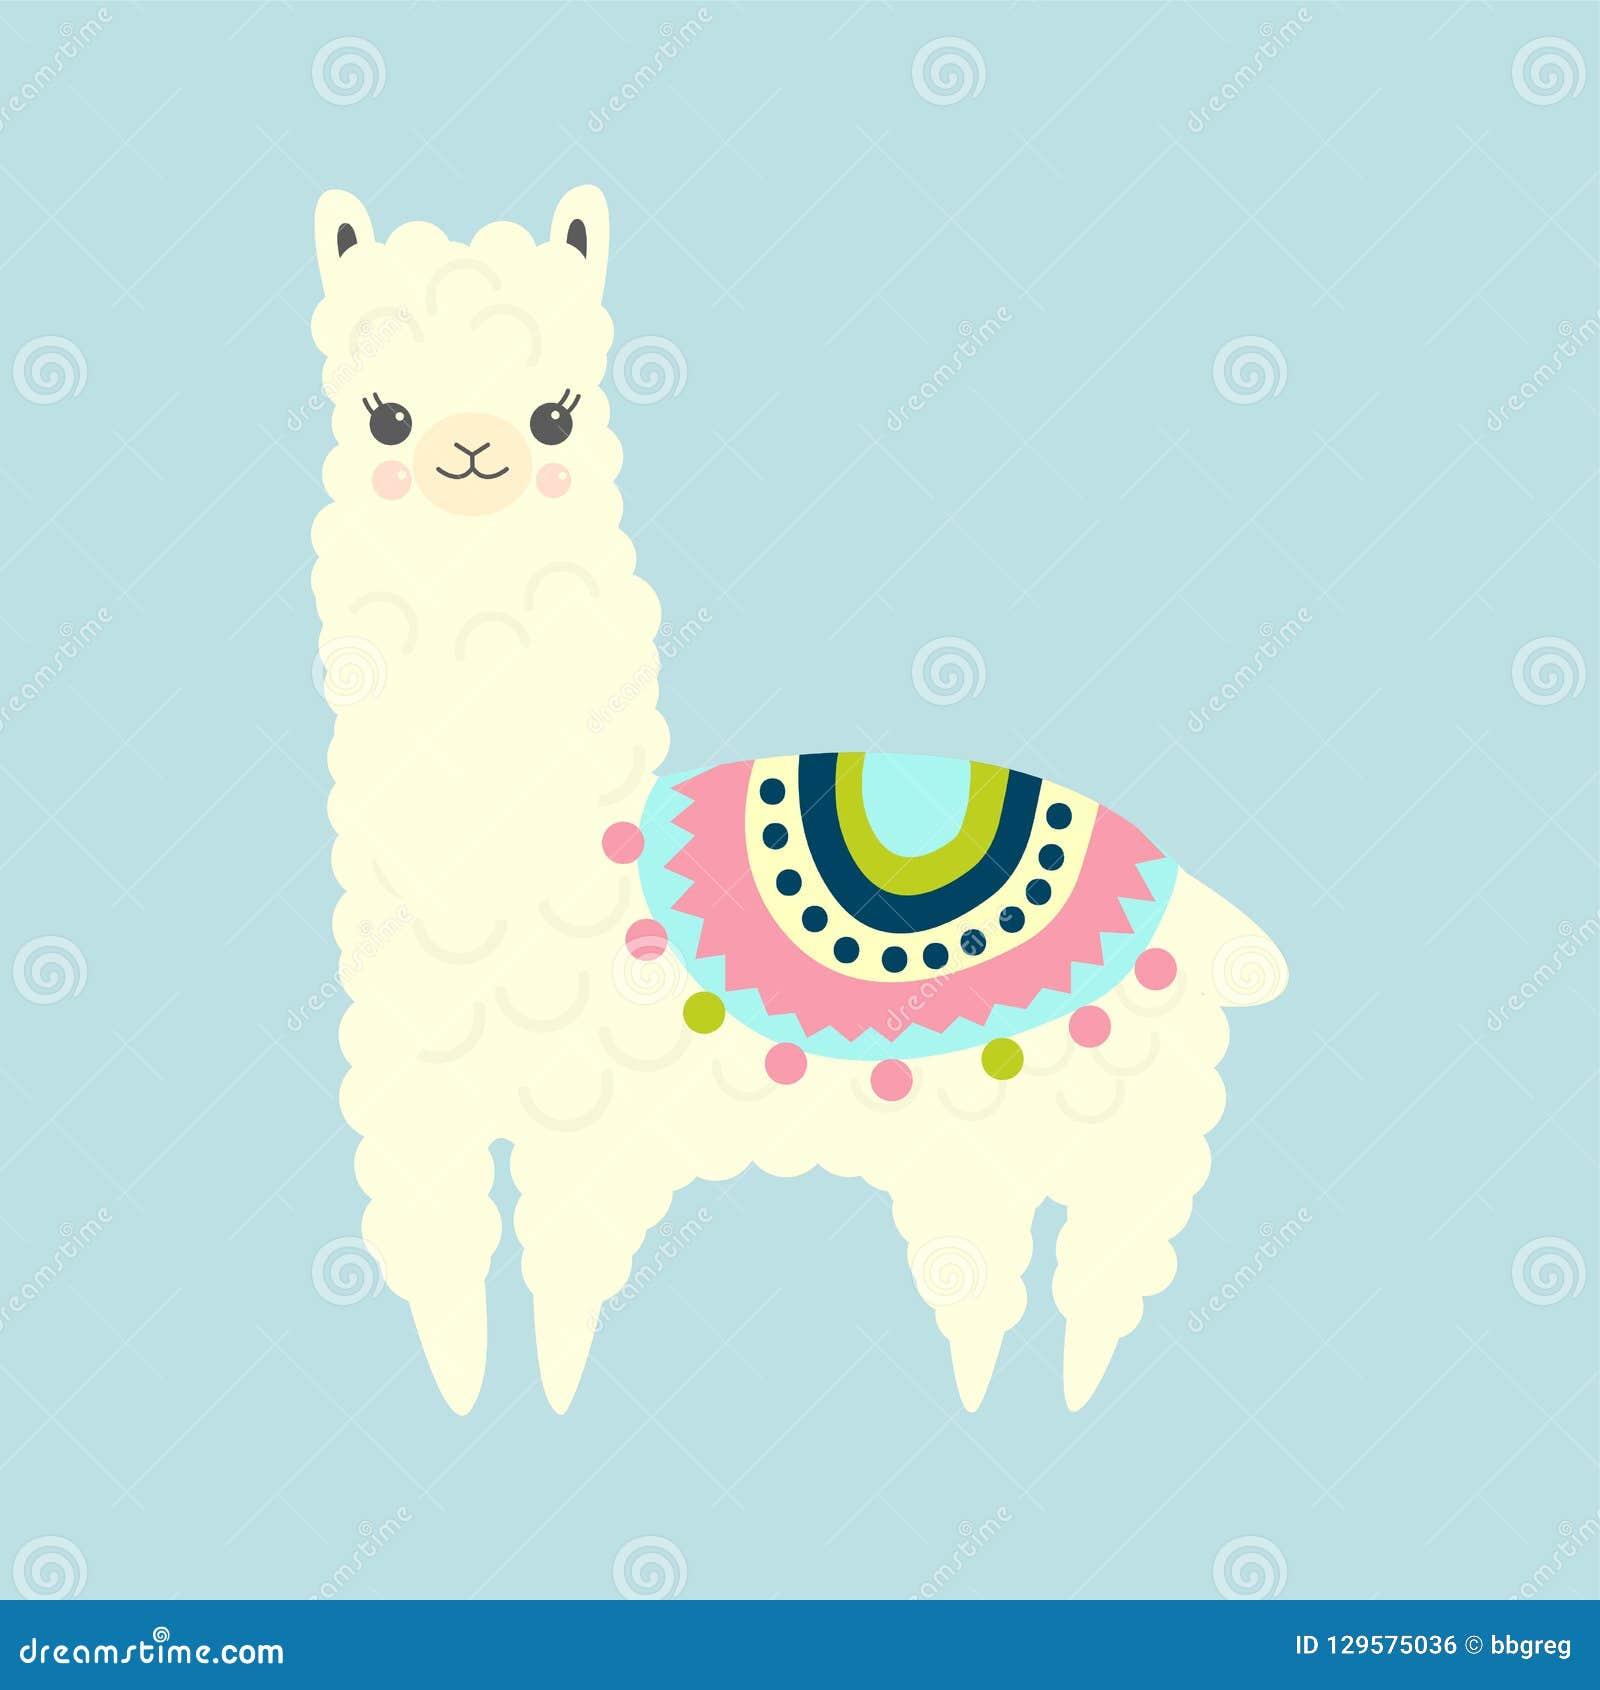 vector illustration of cute fluffy cartoon llama or alpaca